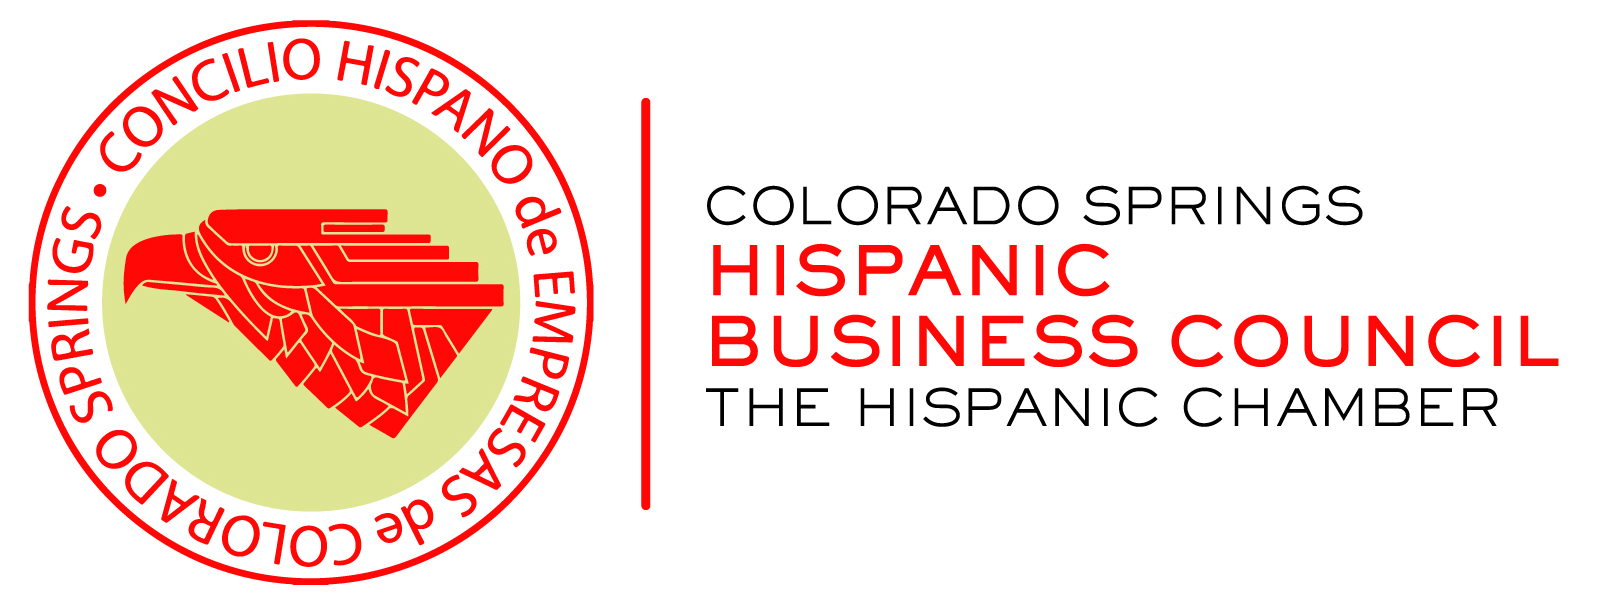 Colorado Springs Hispanic Business Council